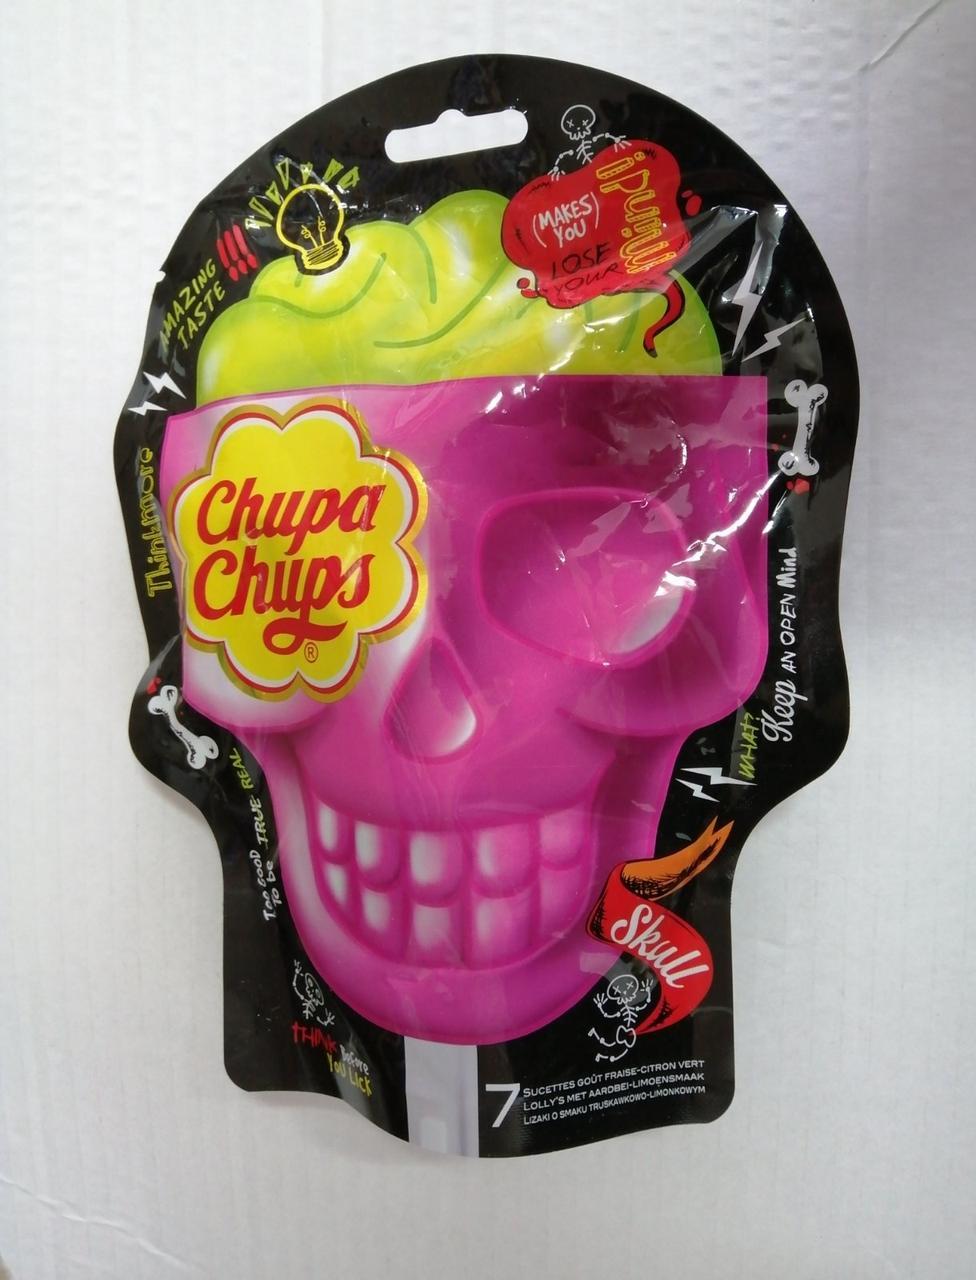 Леденцы Chupa Chups Skull эксклюзивная серия в форме черепа, 7 шт.